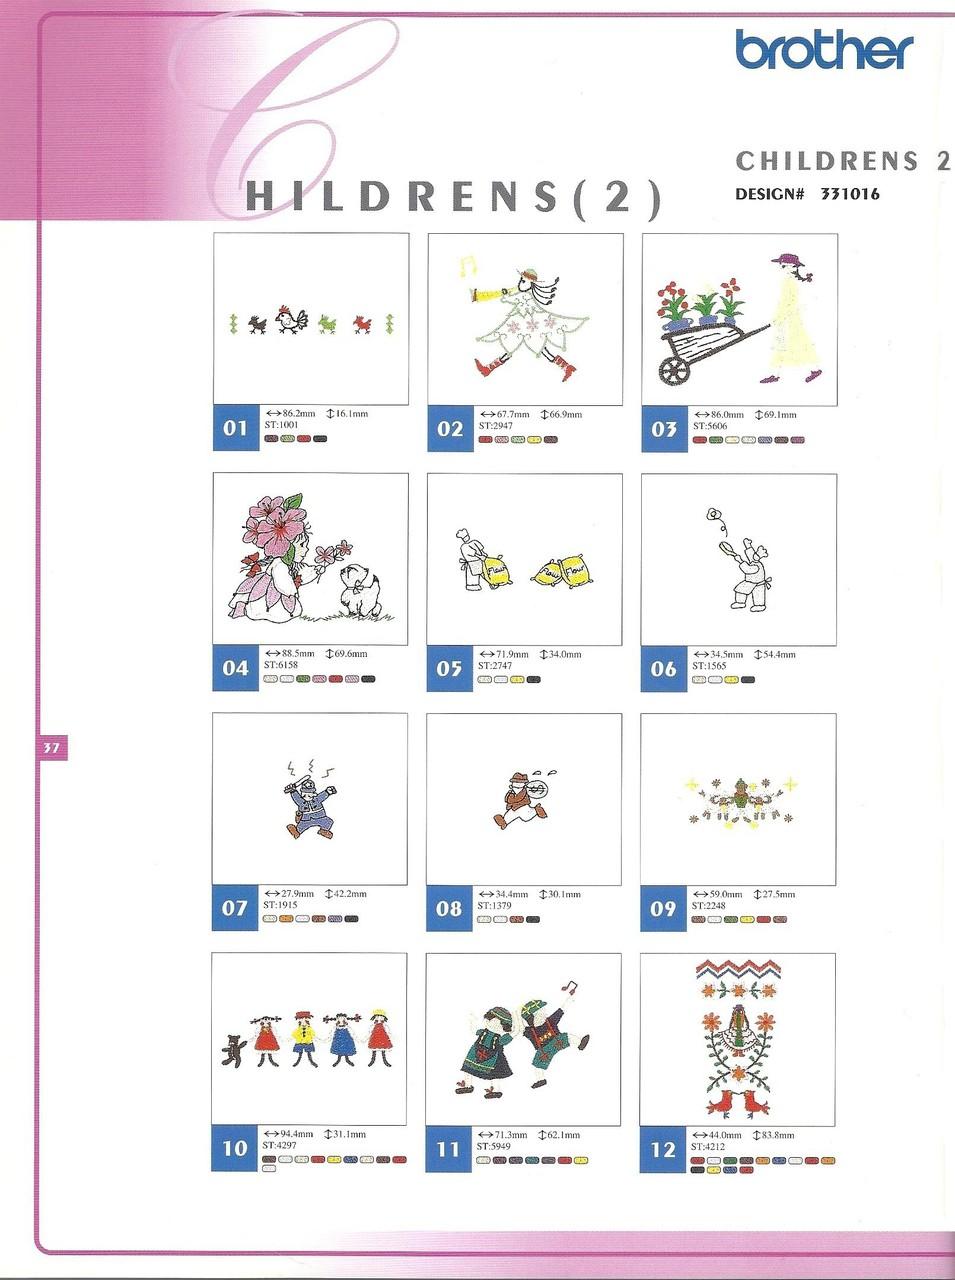 331016 Childrens II